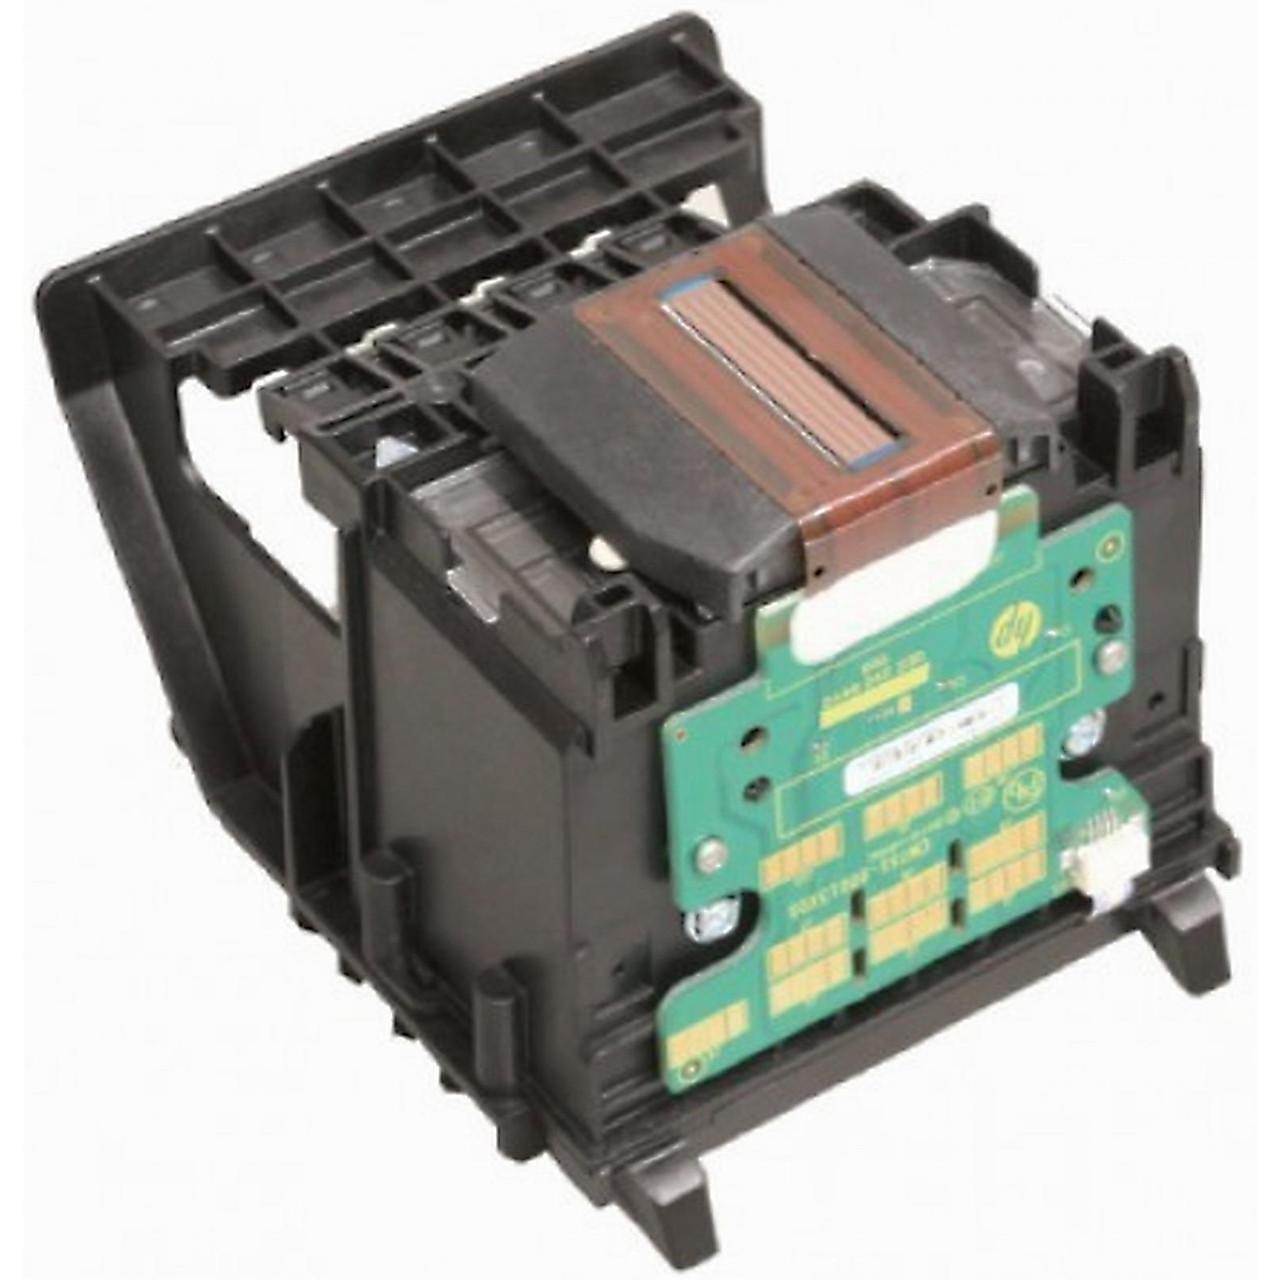 Оригинальная печатающая головка HP №711 Printhead для HP DesignJet T120/T125/T130/T520/T525/T530 без упаковки